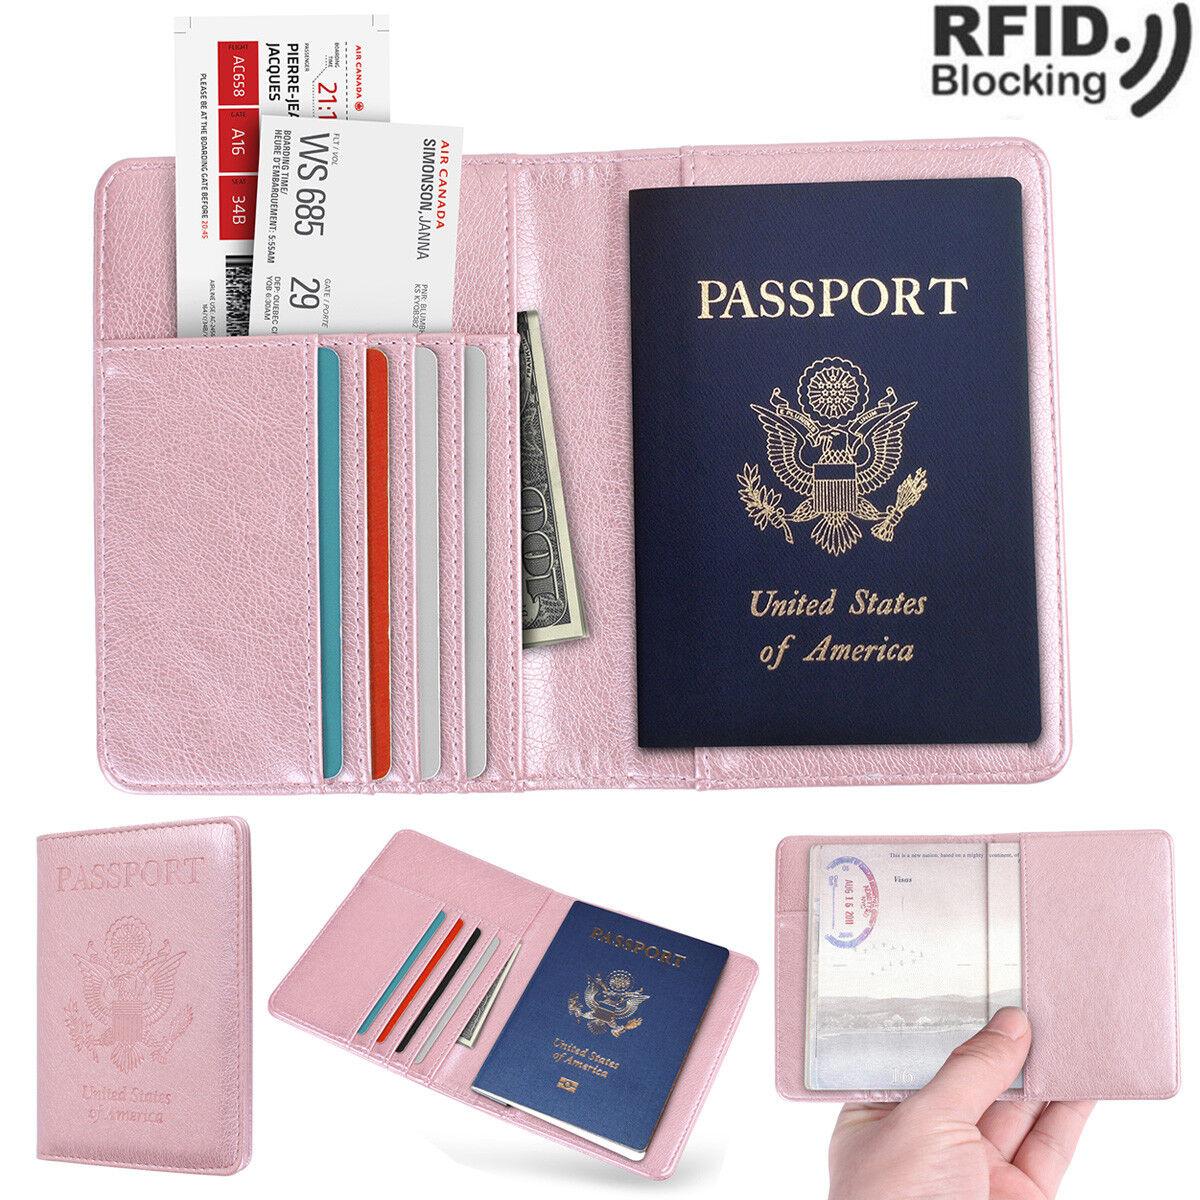 Steal My Heart Girl Brunette Smile Background Leather Passport Holder Cover Case Travel One Pocket